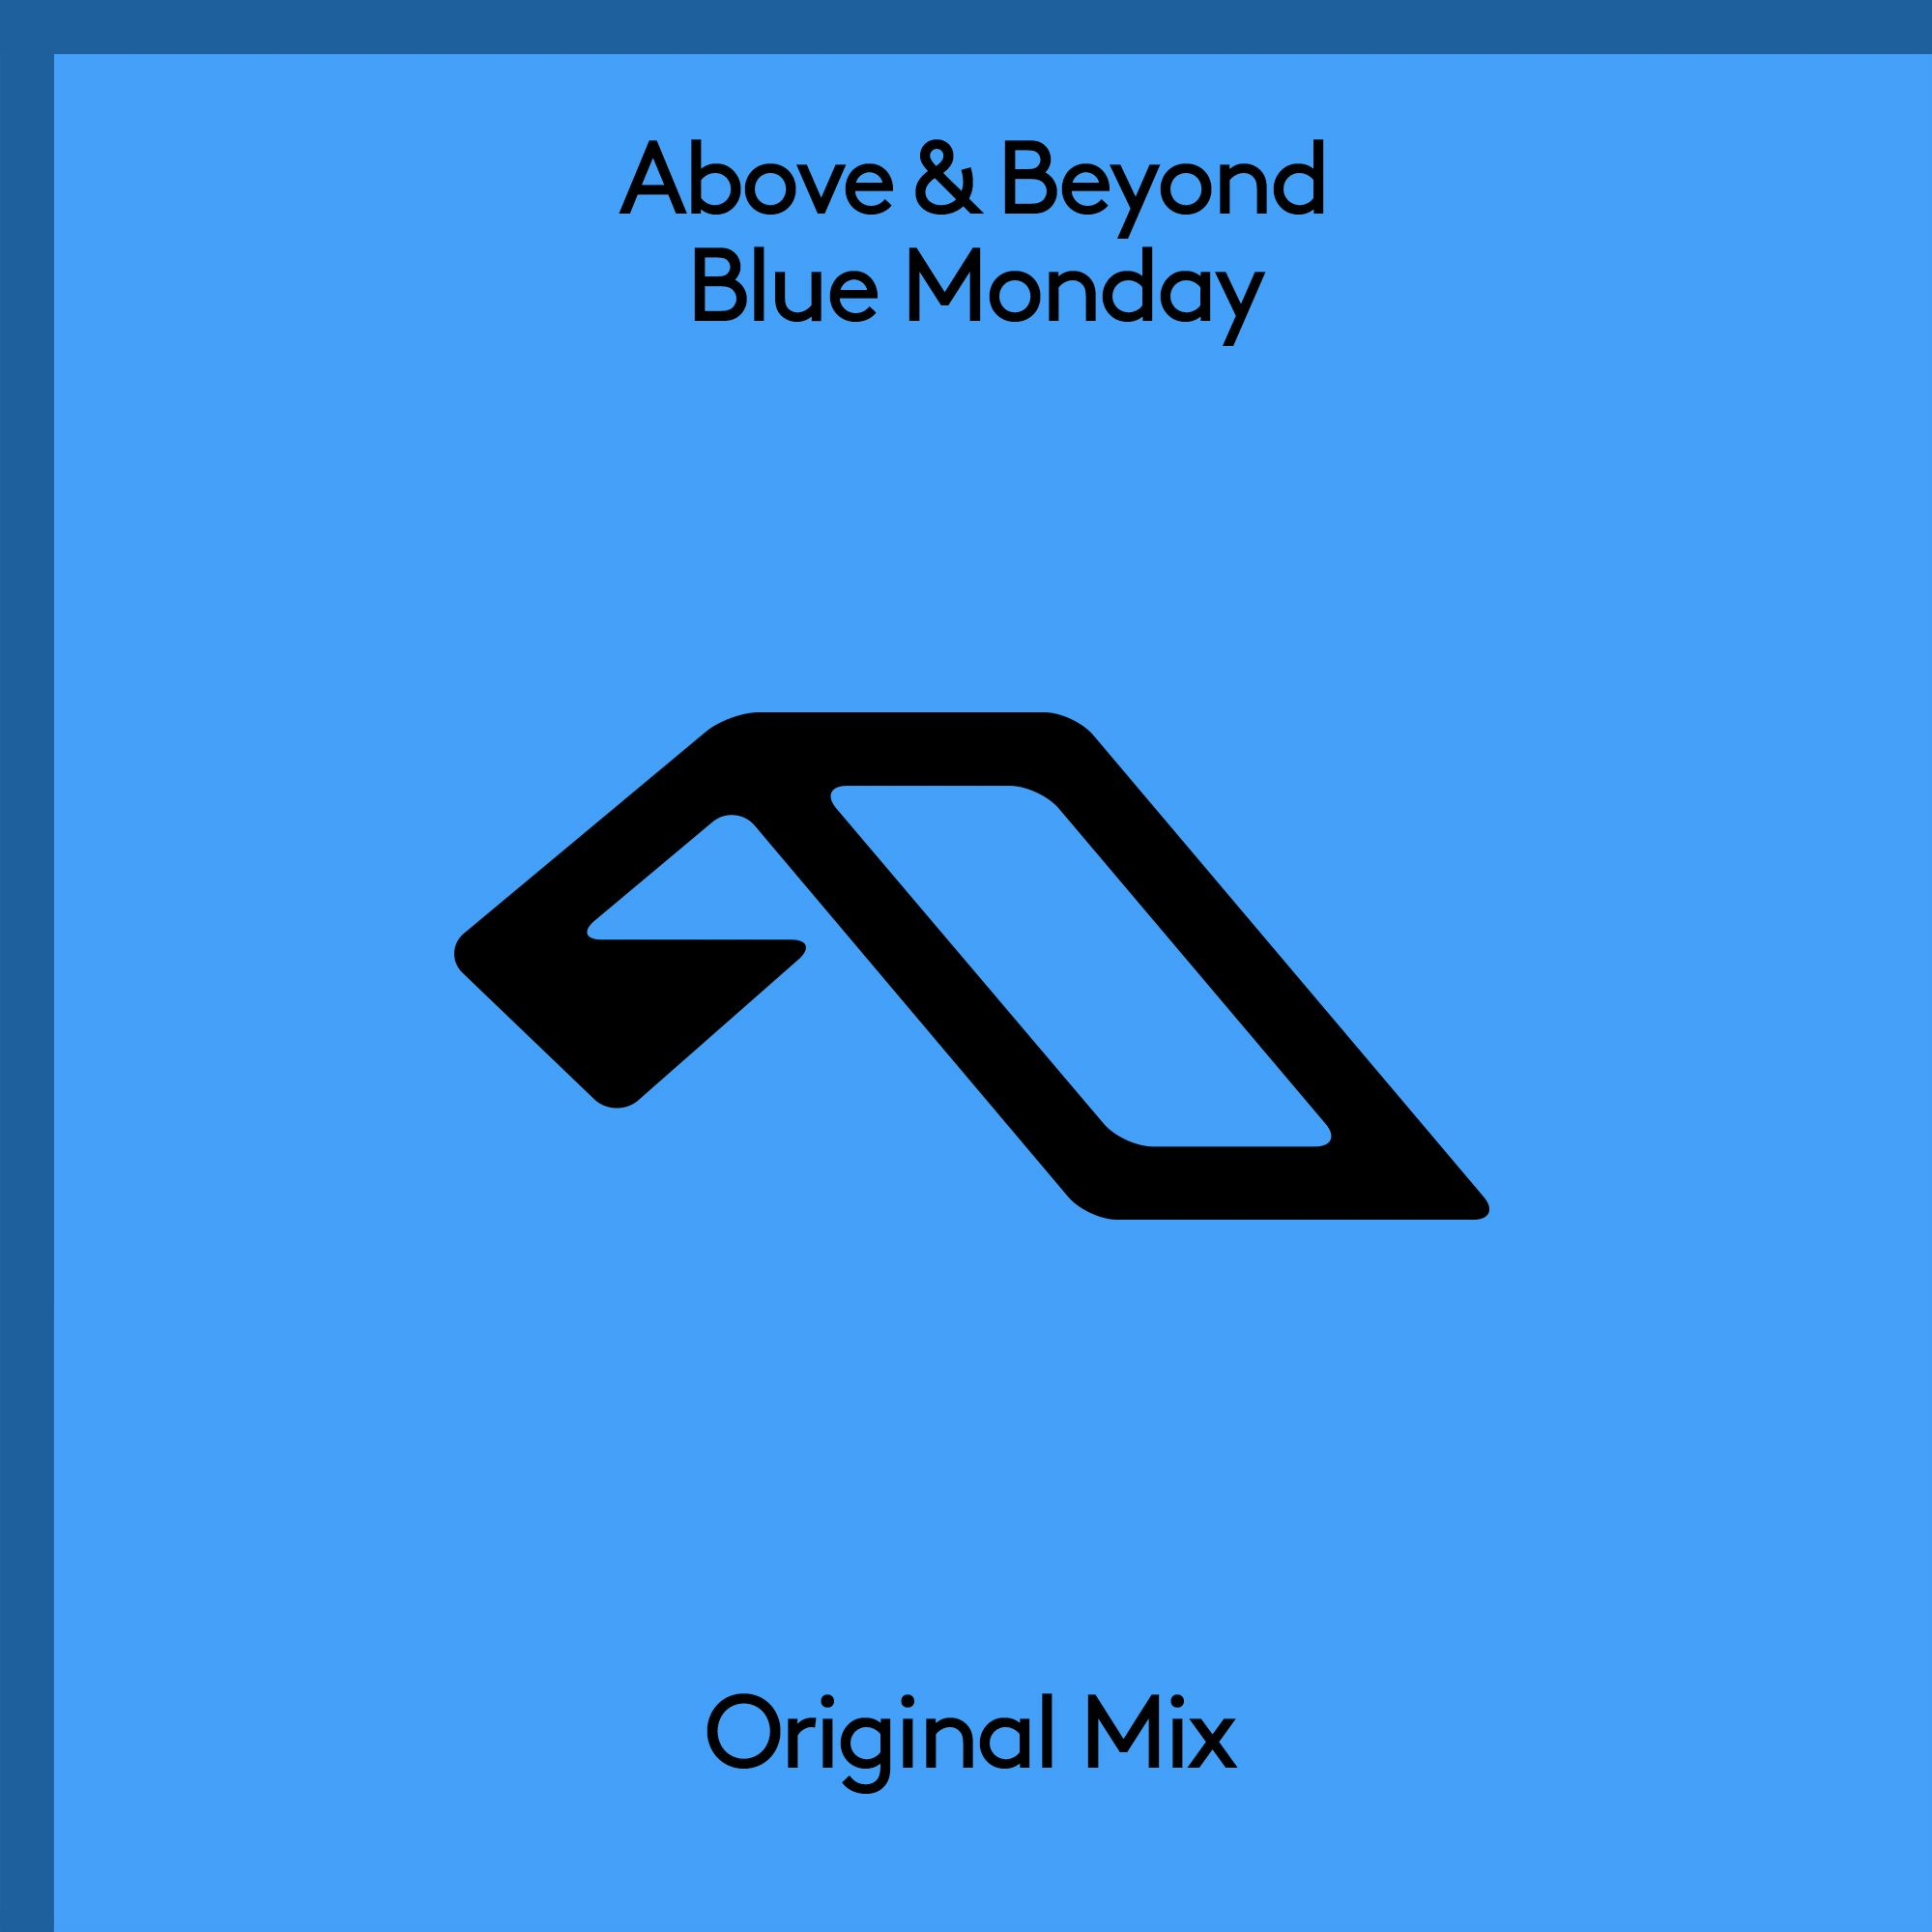 Above & Beyond - Blue Monday